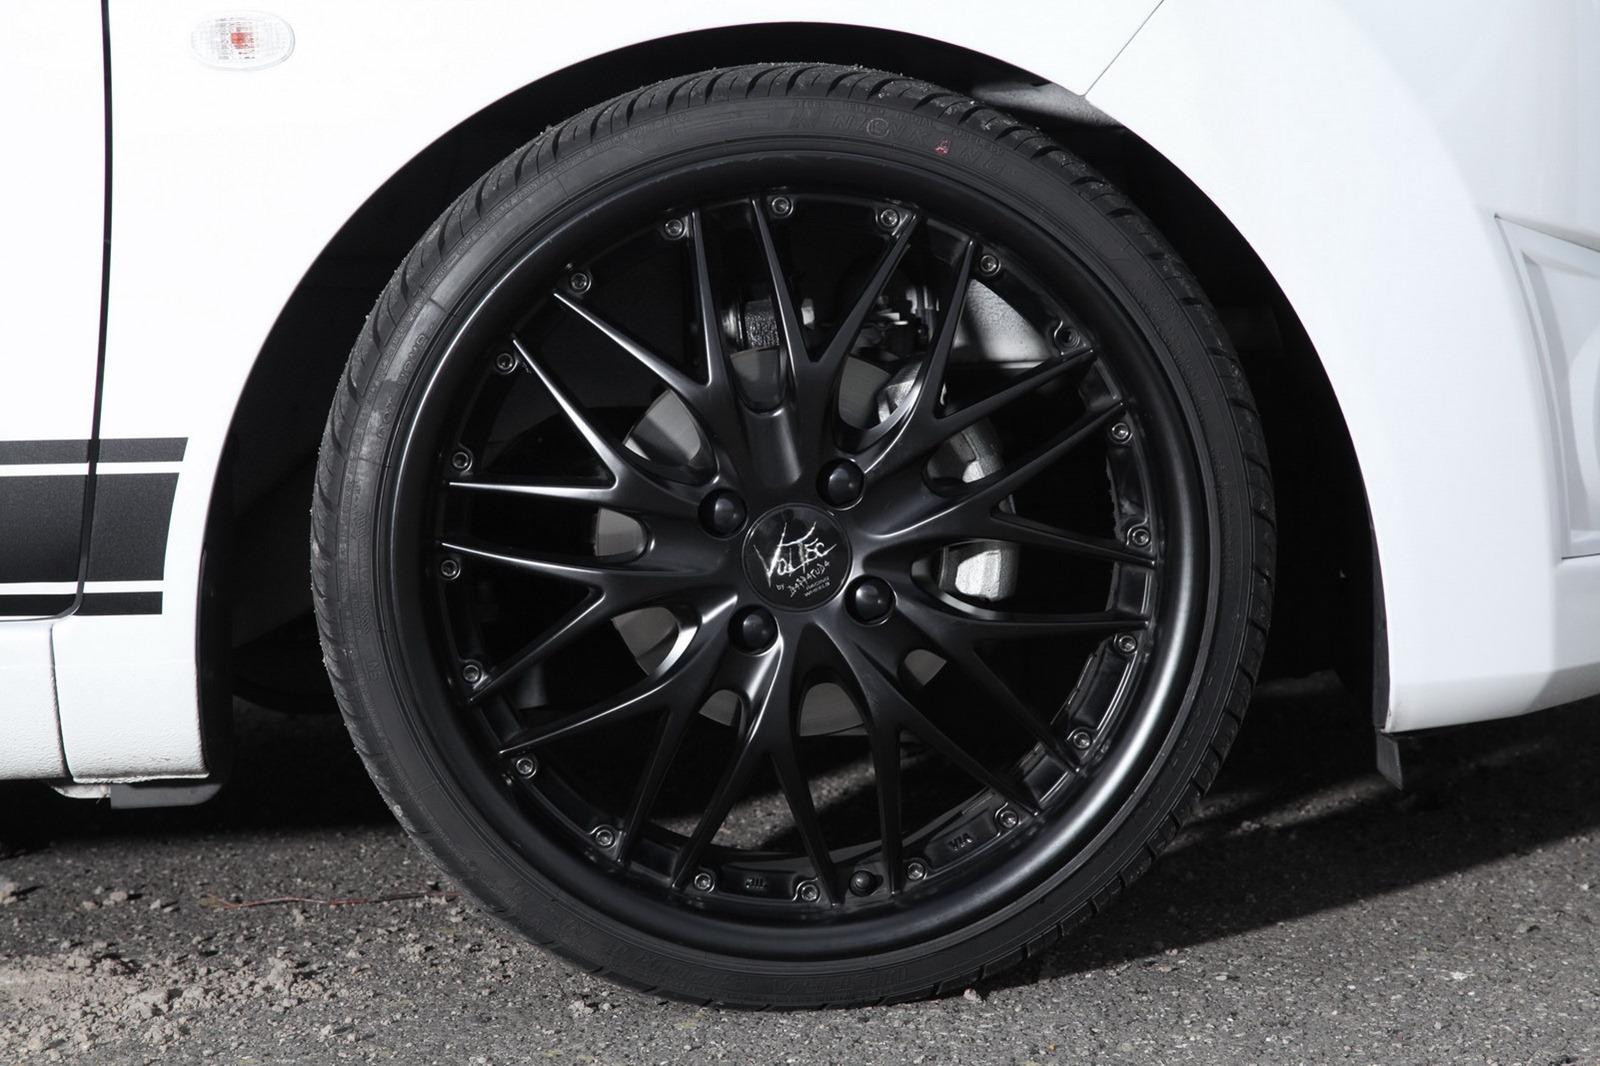 KBR Motorsport lehce vylepšili Chevrolet Spark 7